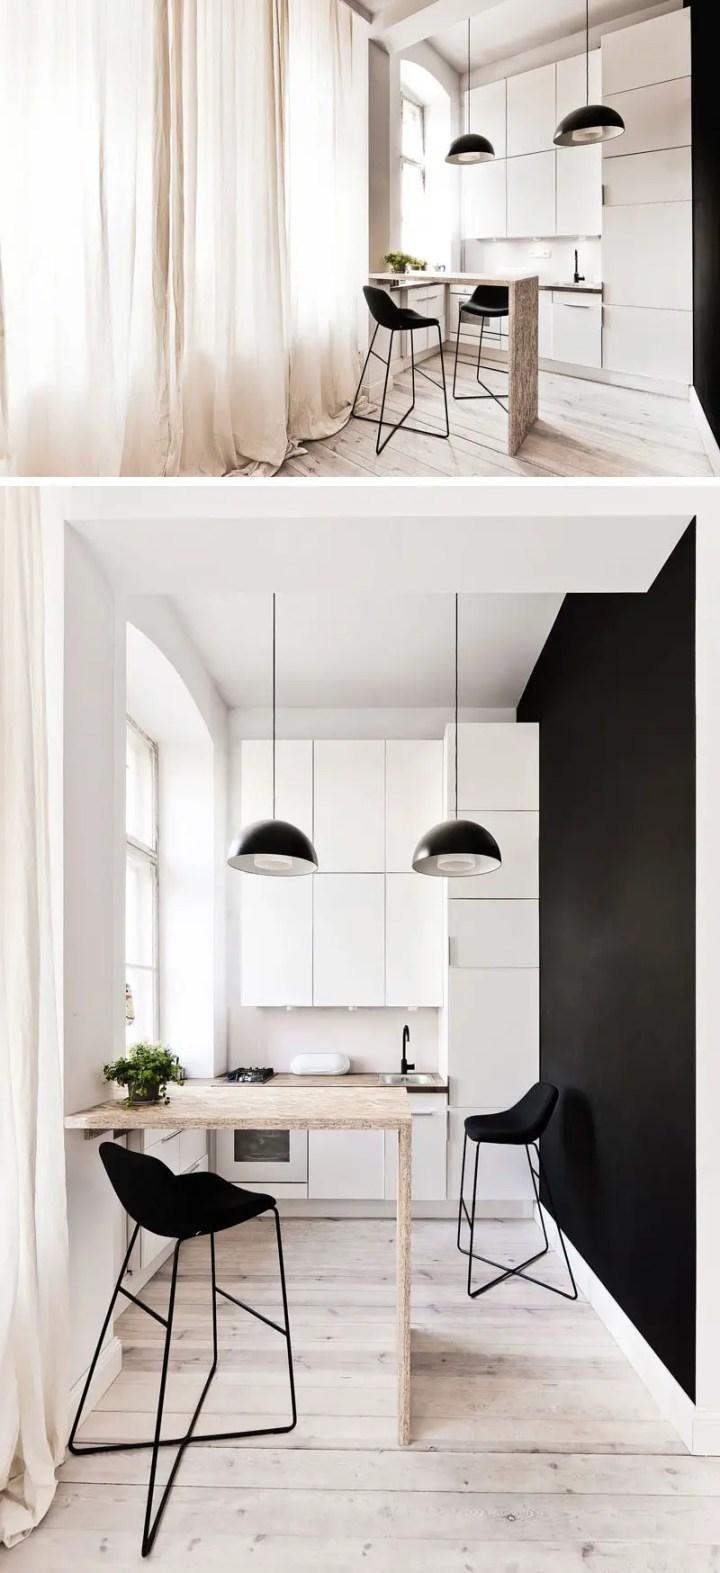 amenajarea unui apartament de 29 de metri patrati Smart design on just 29 square meters 4